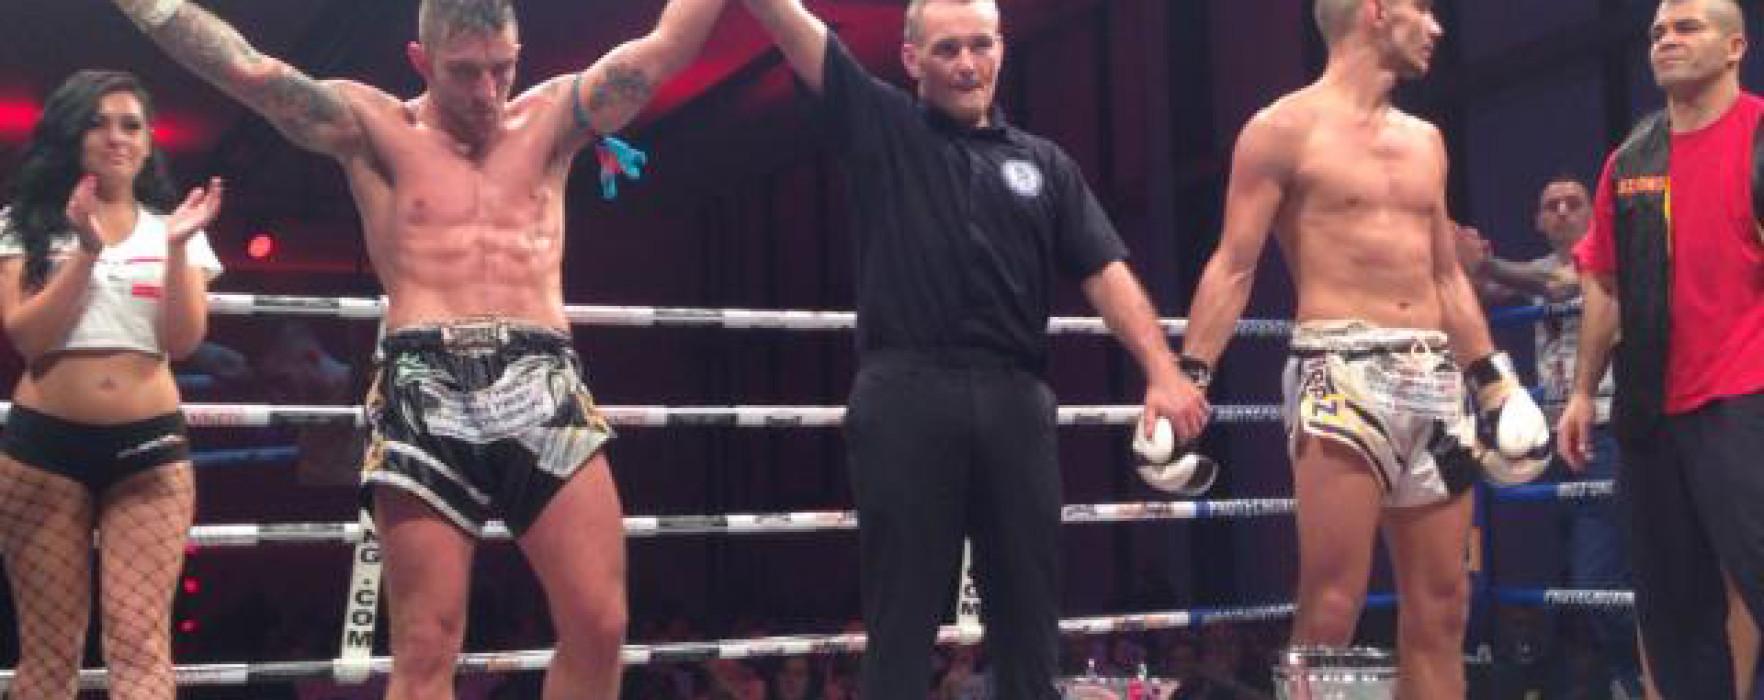 Video: Liam Harrison defeats Dylan Salvador – UK 2/11/13